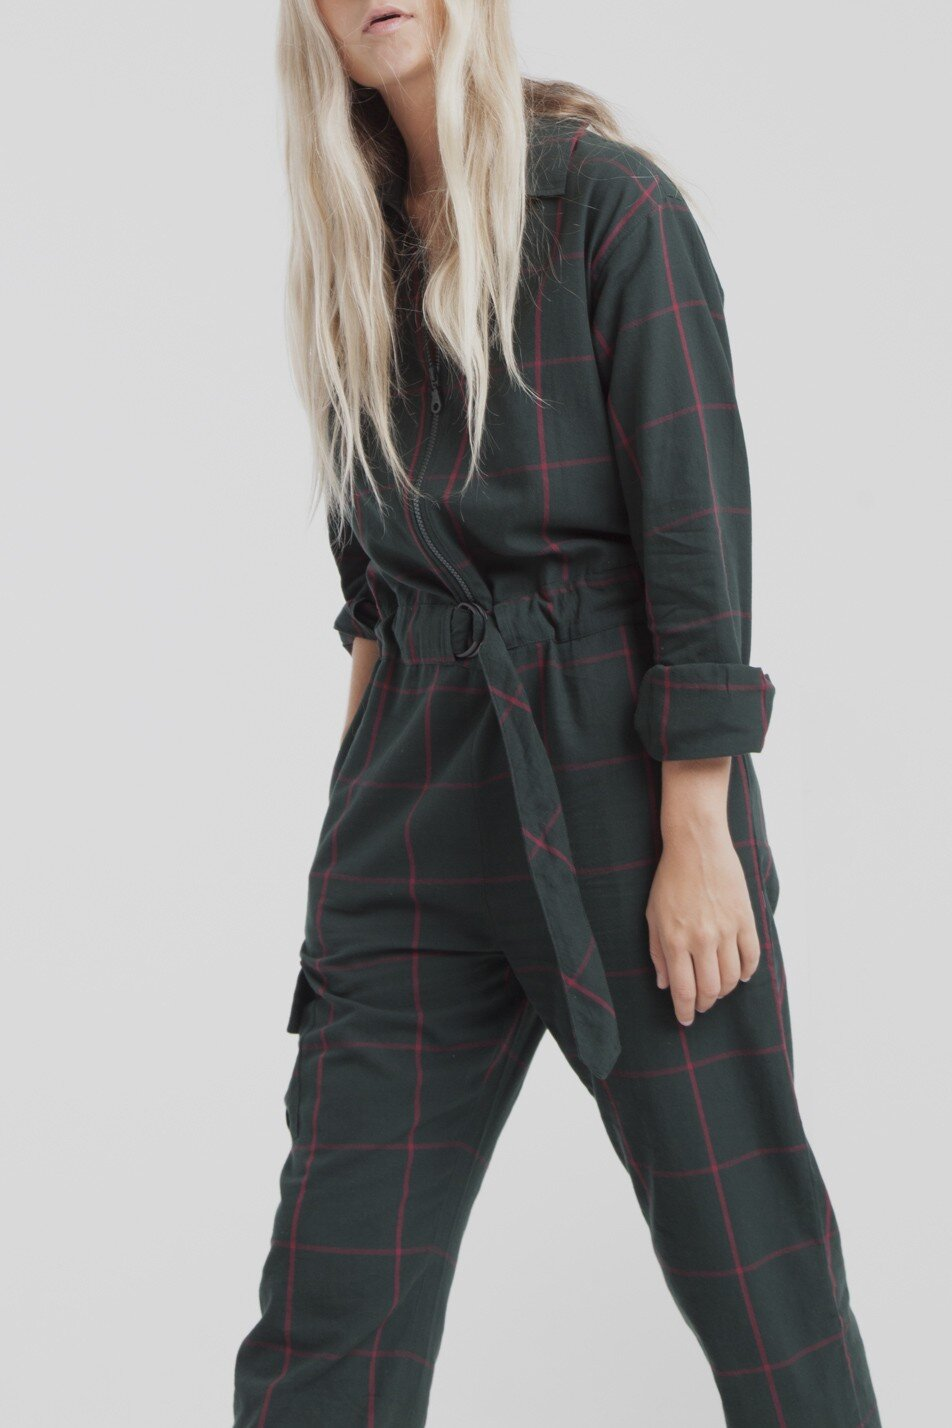 green-checks-tomboy-jumpsuit-2.jpg